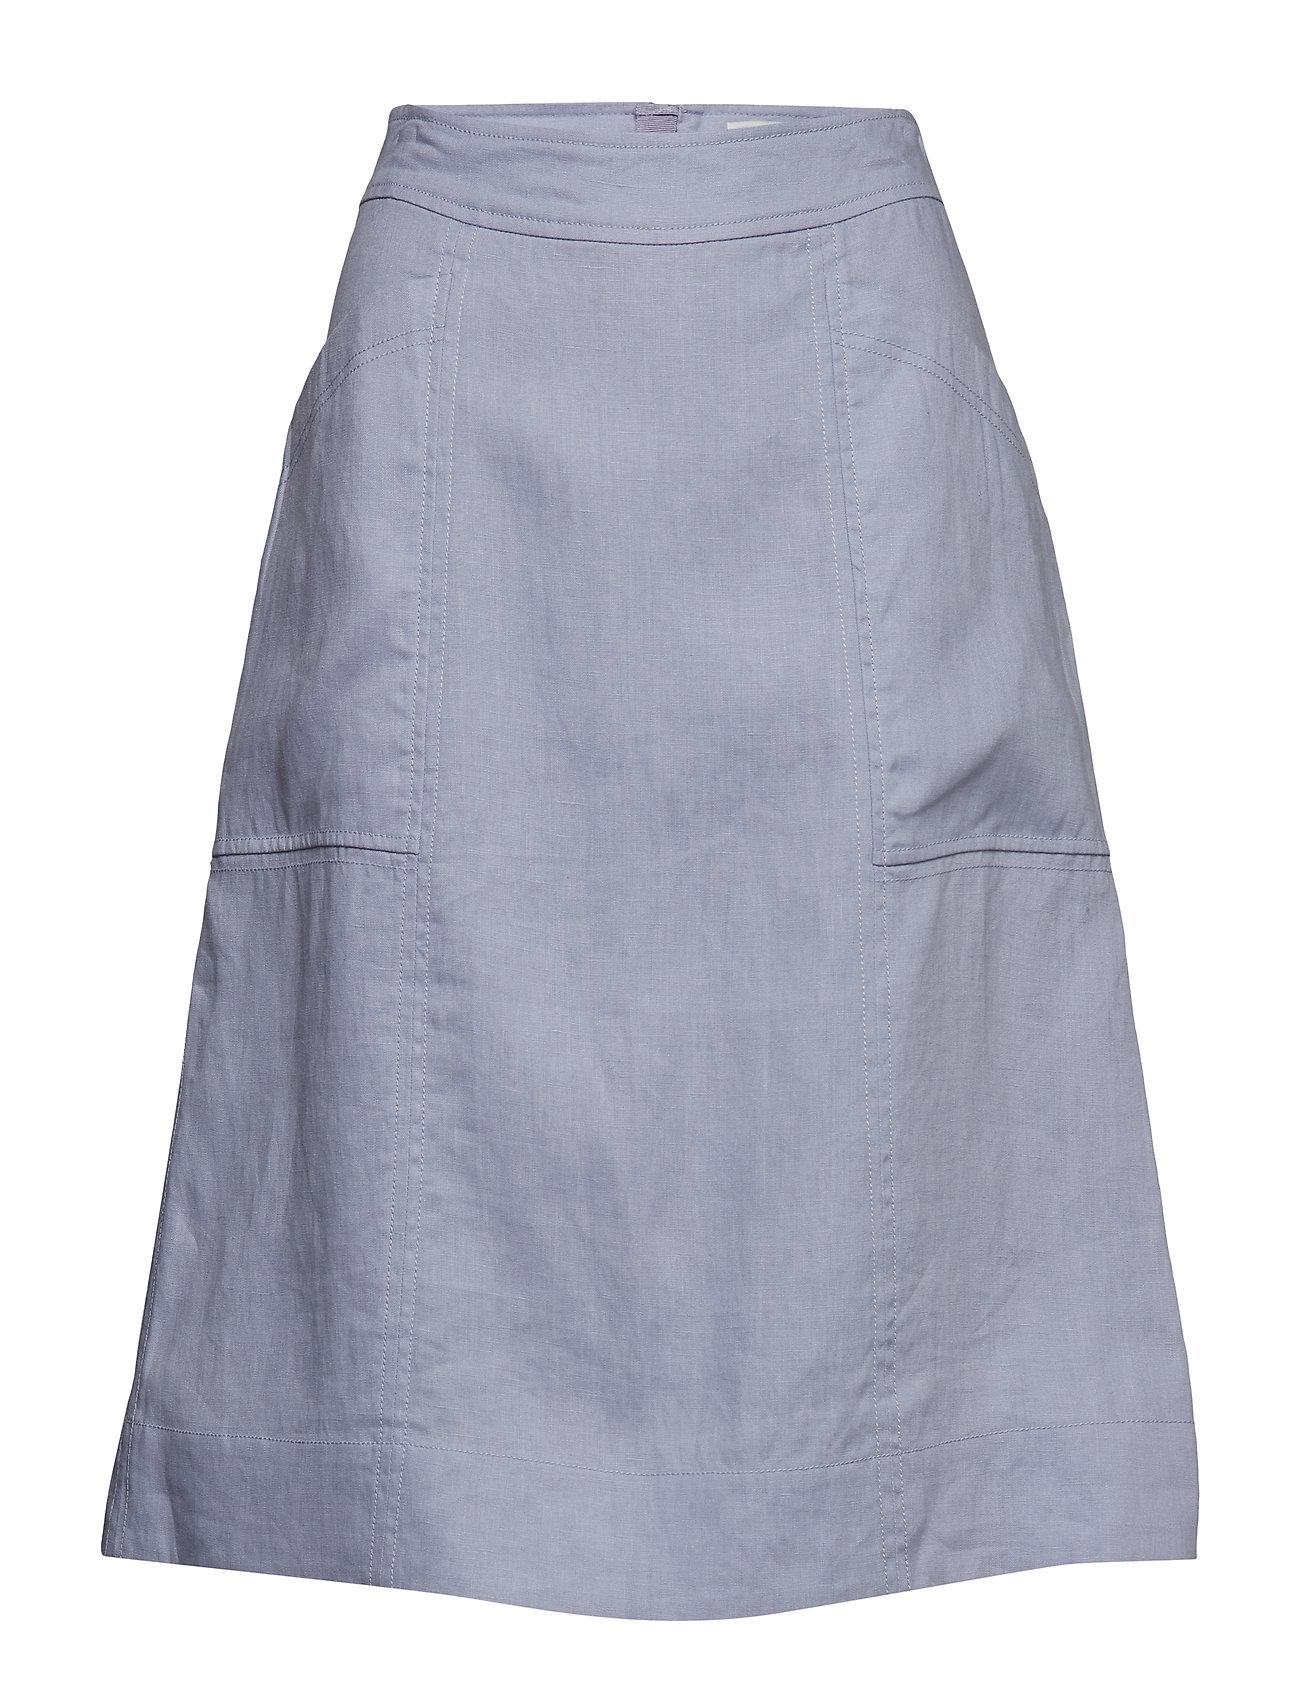 Skirt Knælang Nederdel Blå Noa Noa